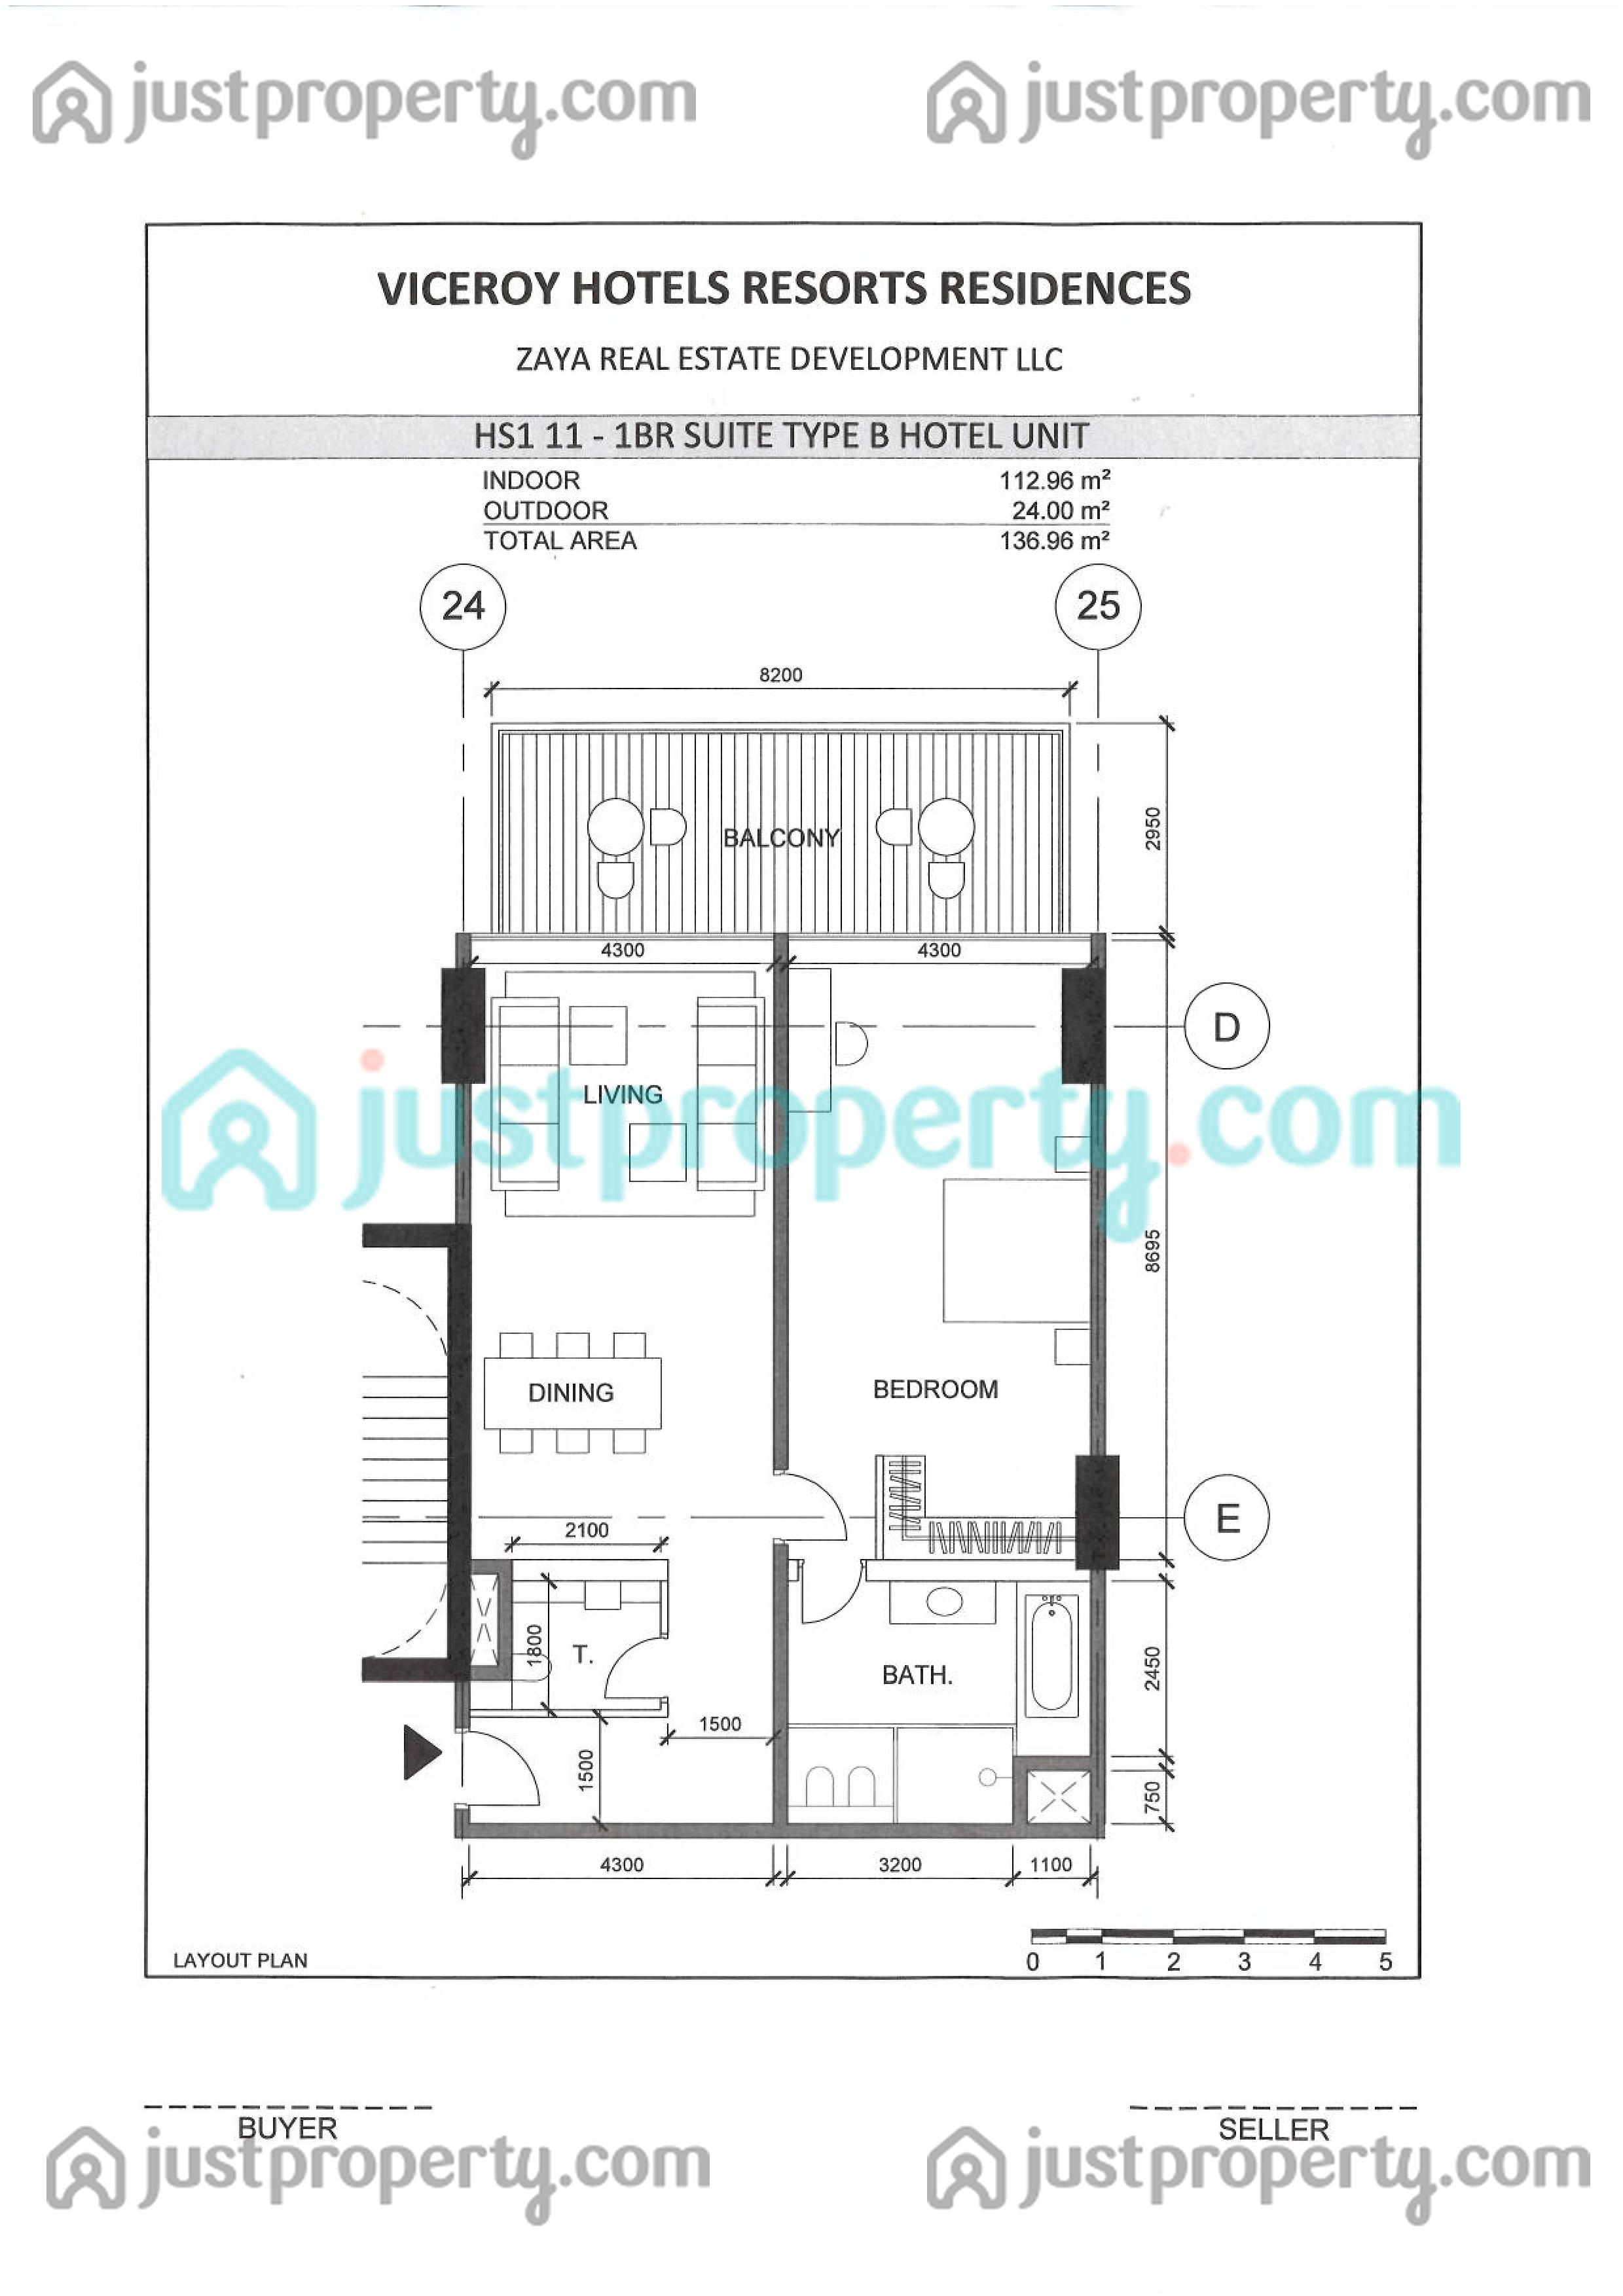 Viceroy Signature Residences Floor Plans | JustProperty.com